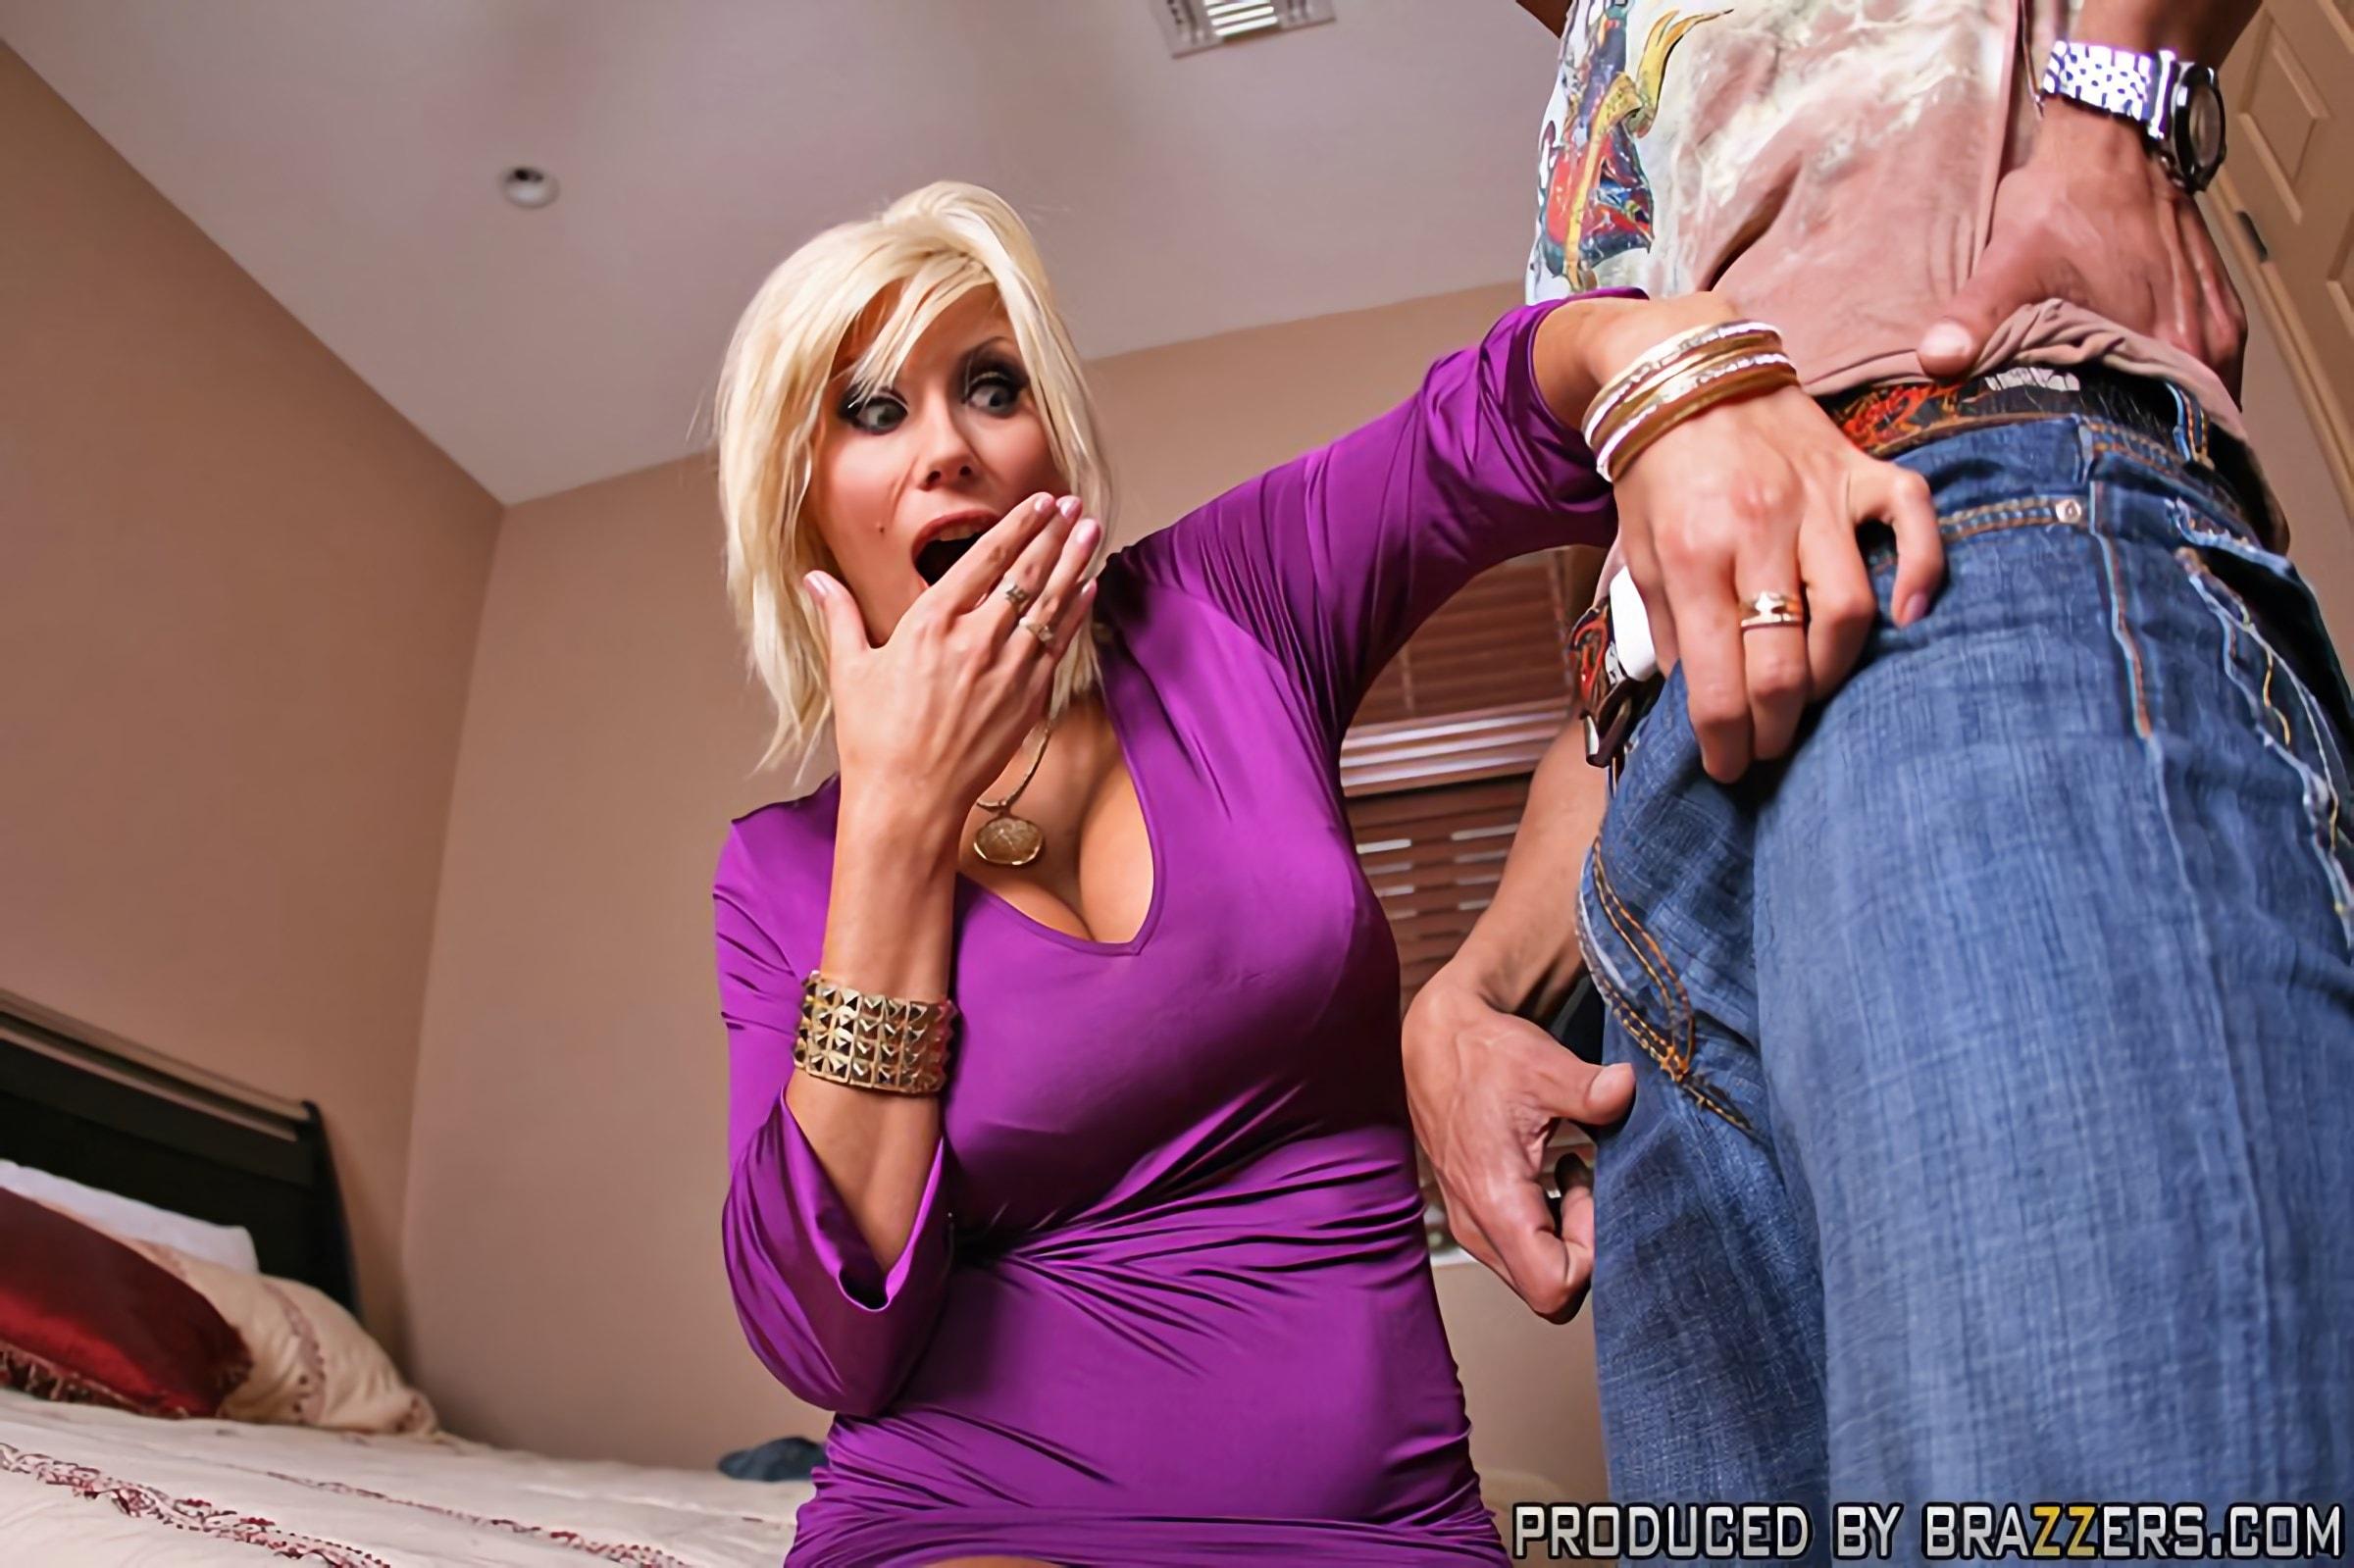 Milfslikeitbig puma swede ddfprod blonde twerk porn free pornpics sexphotos xxximages hq gallery